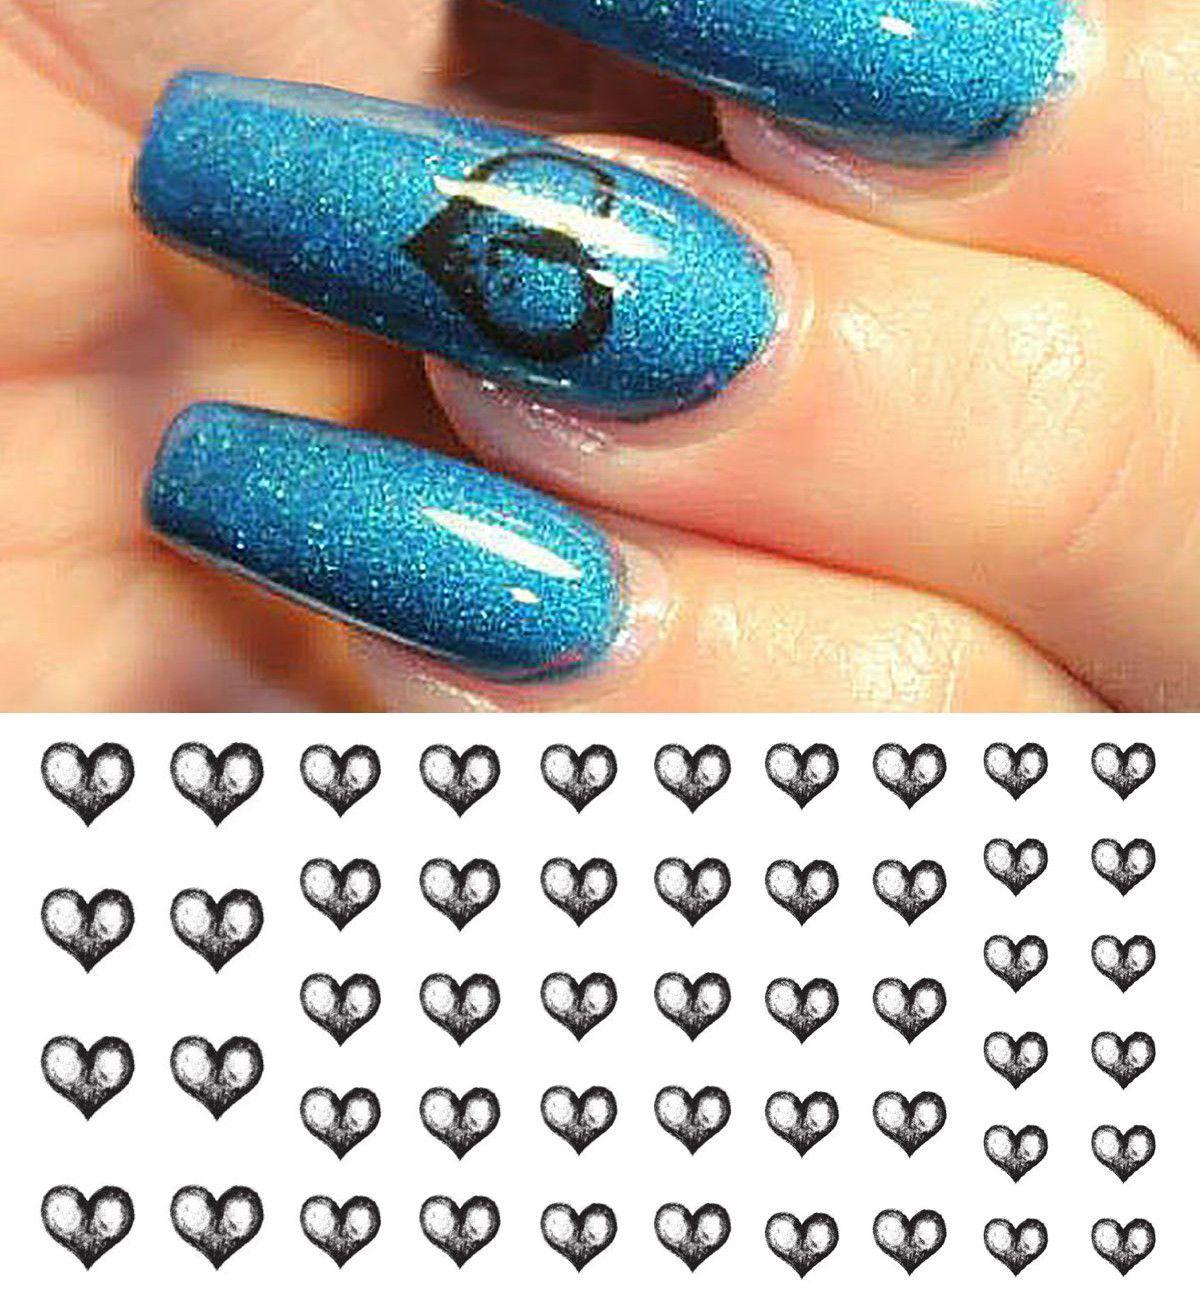 Black Heart Nail Art Decals | Nail decals